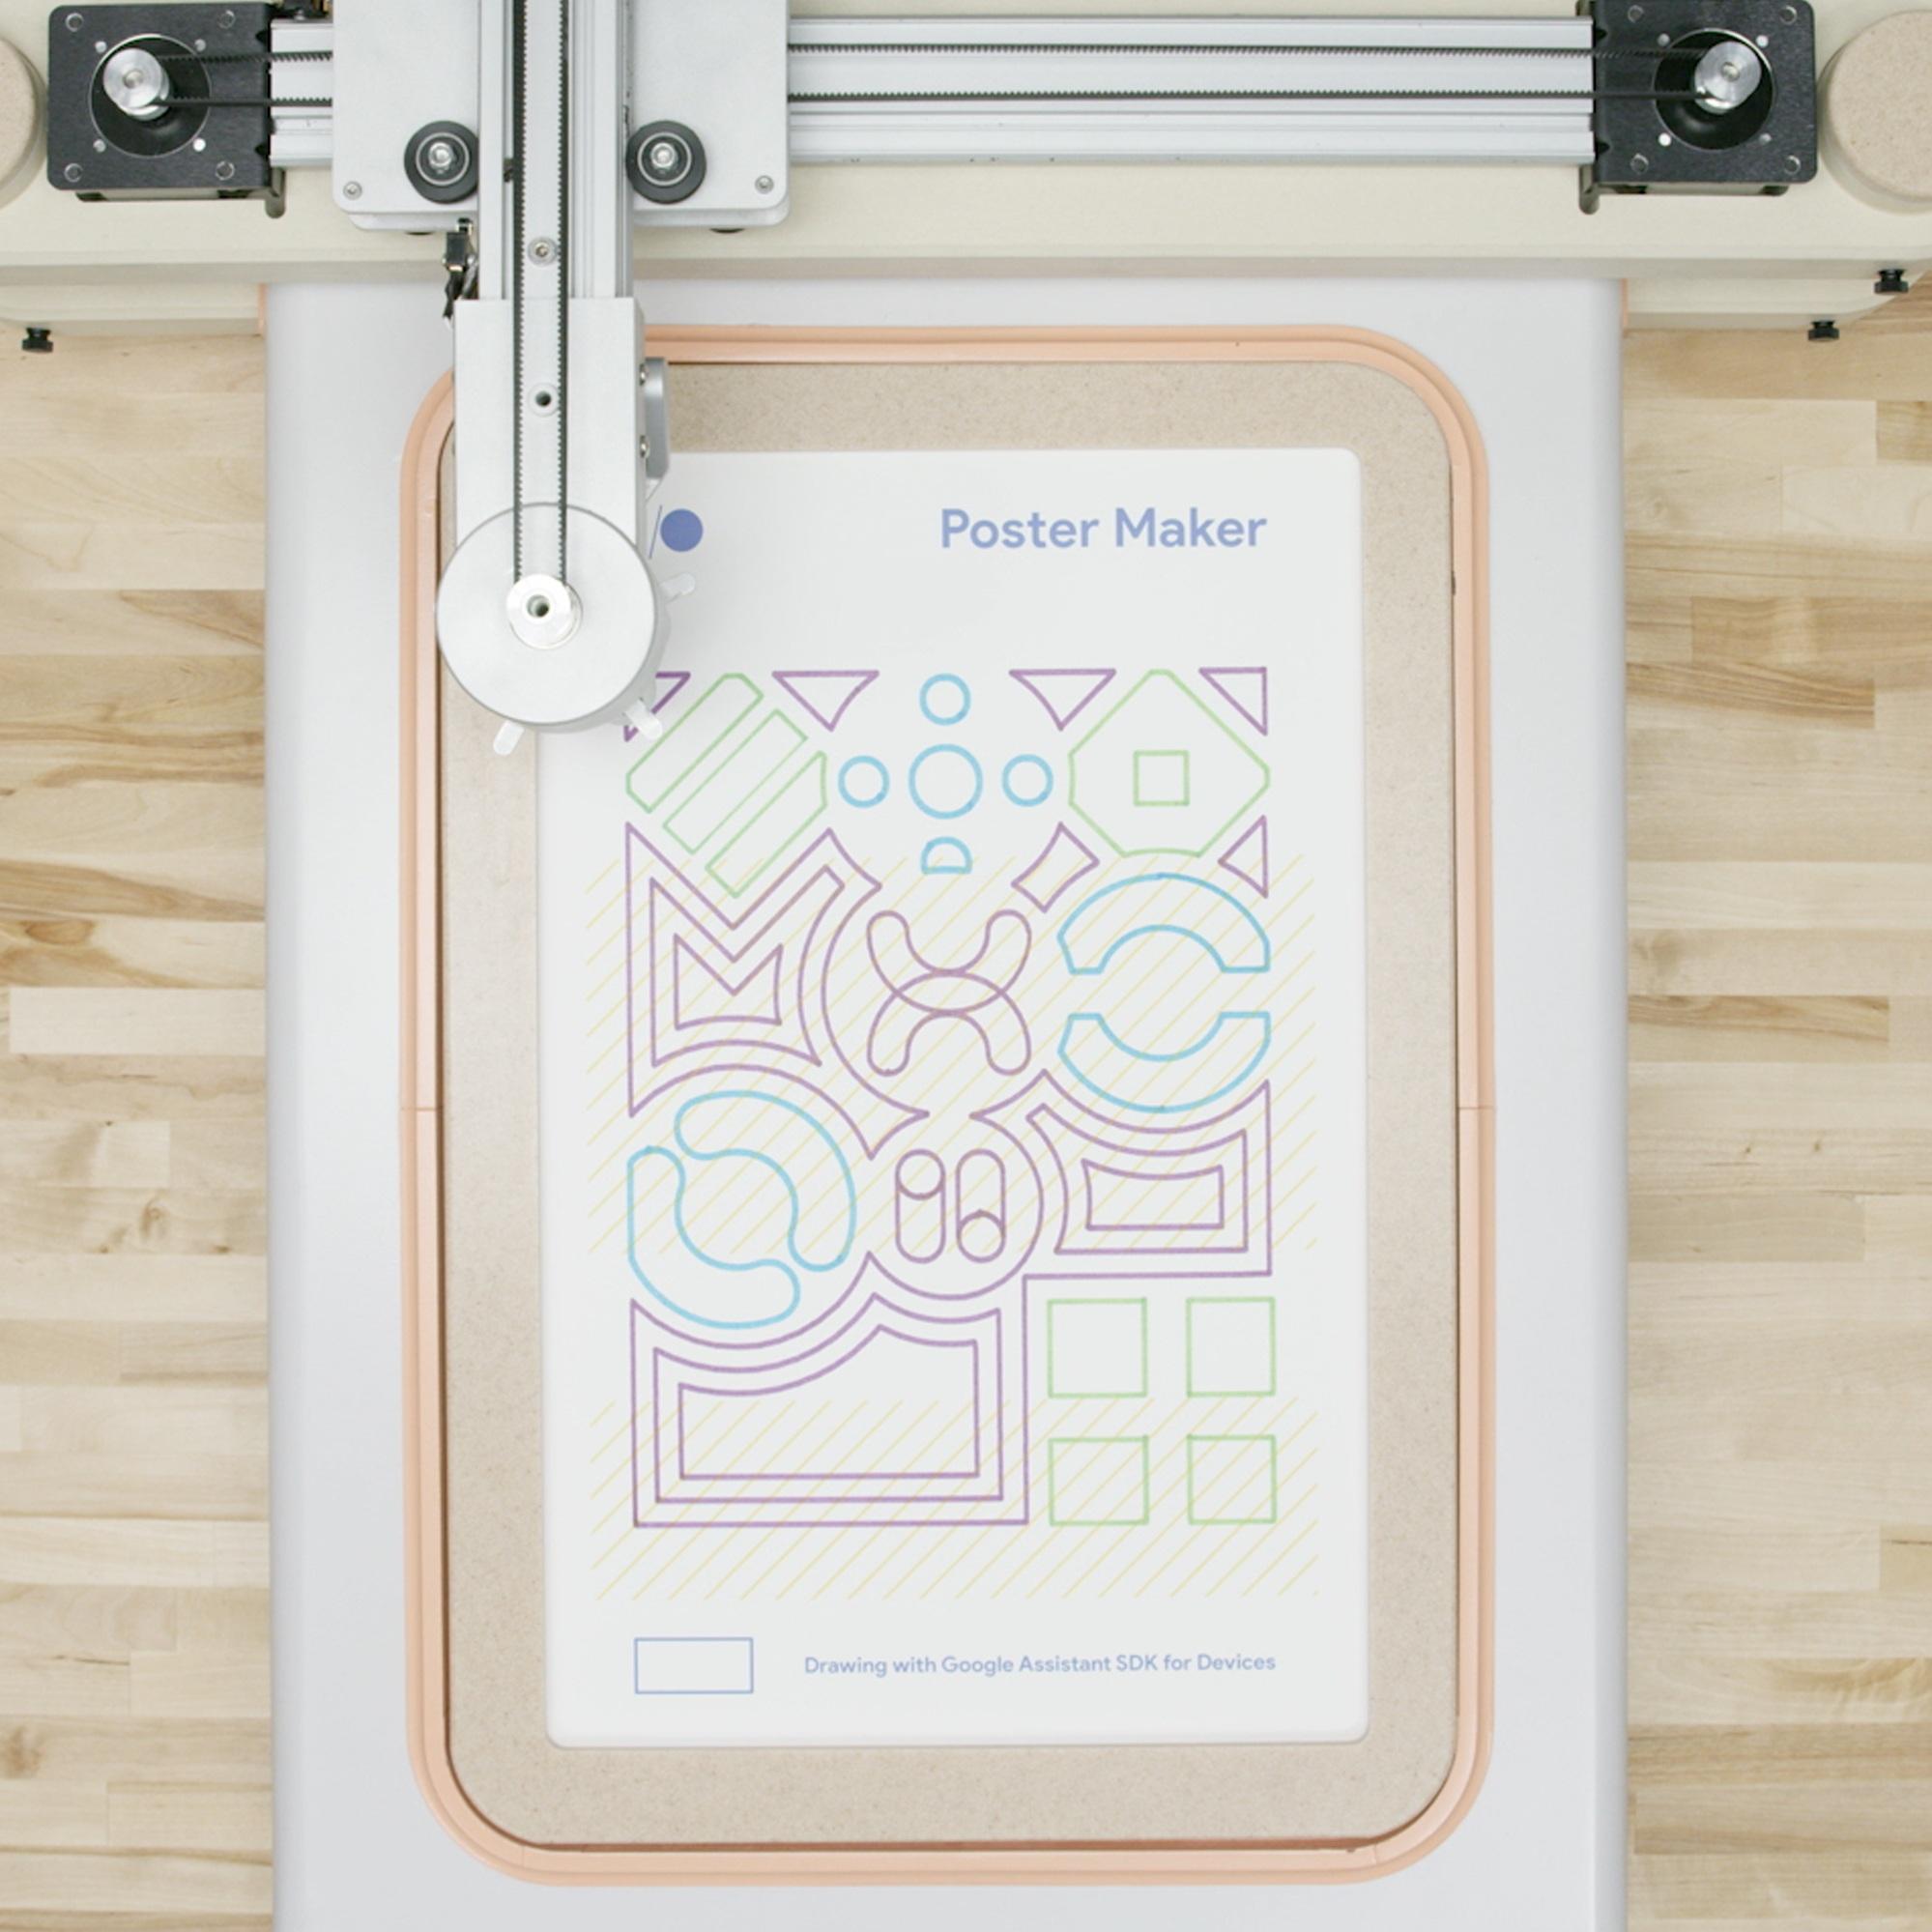 GOOGLE POSTER MAKER - A poster-making robot creates custom art based on voice commands.